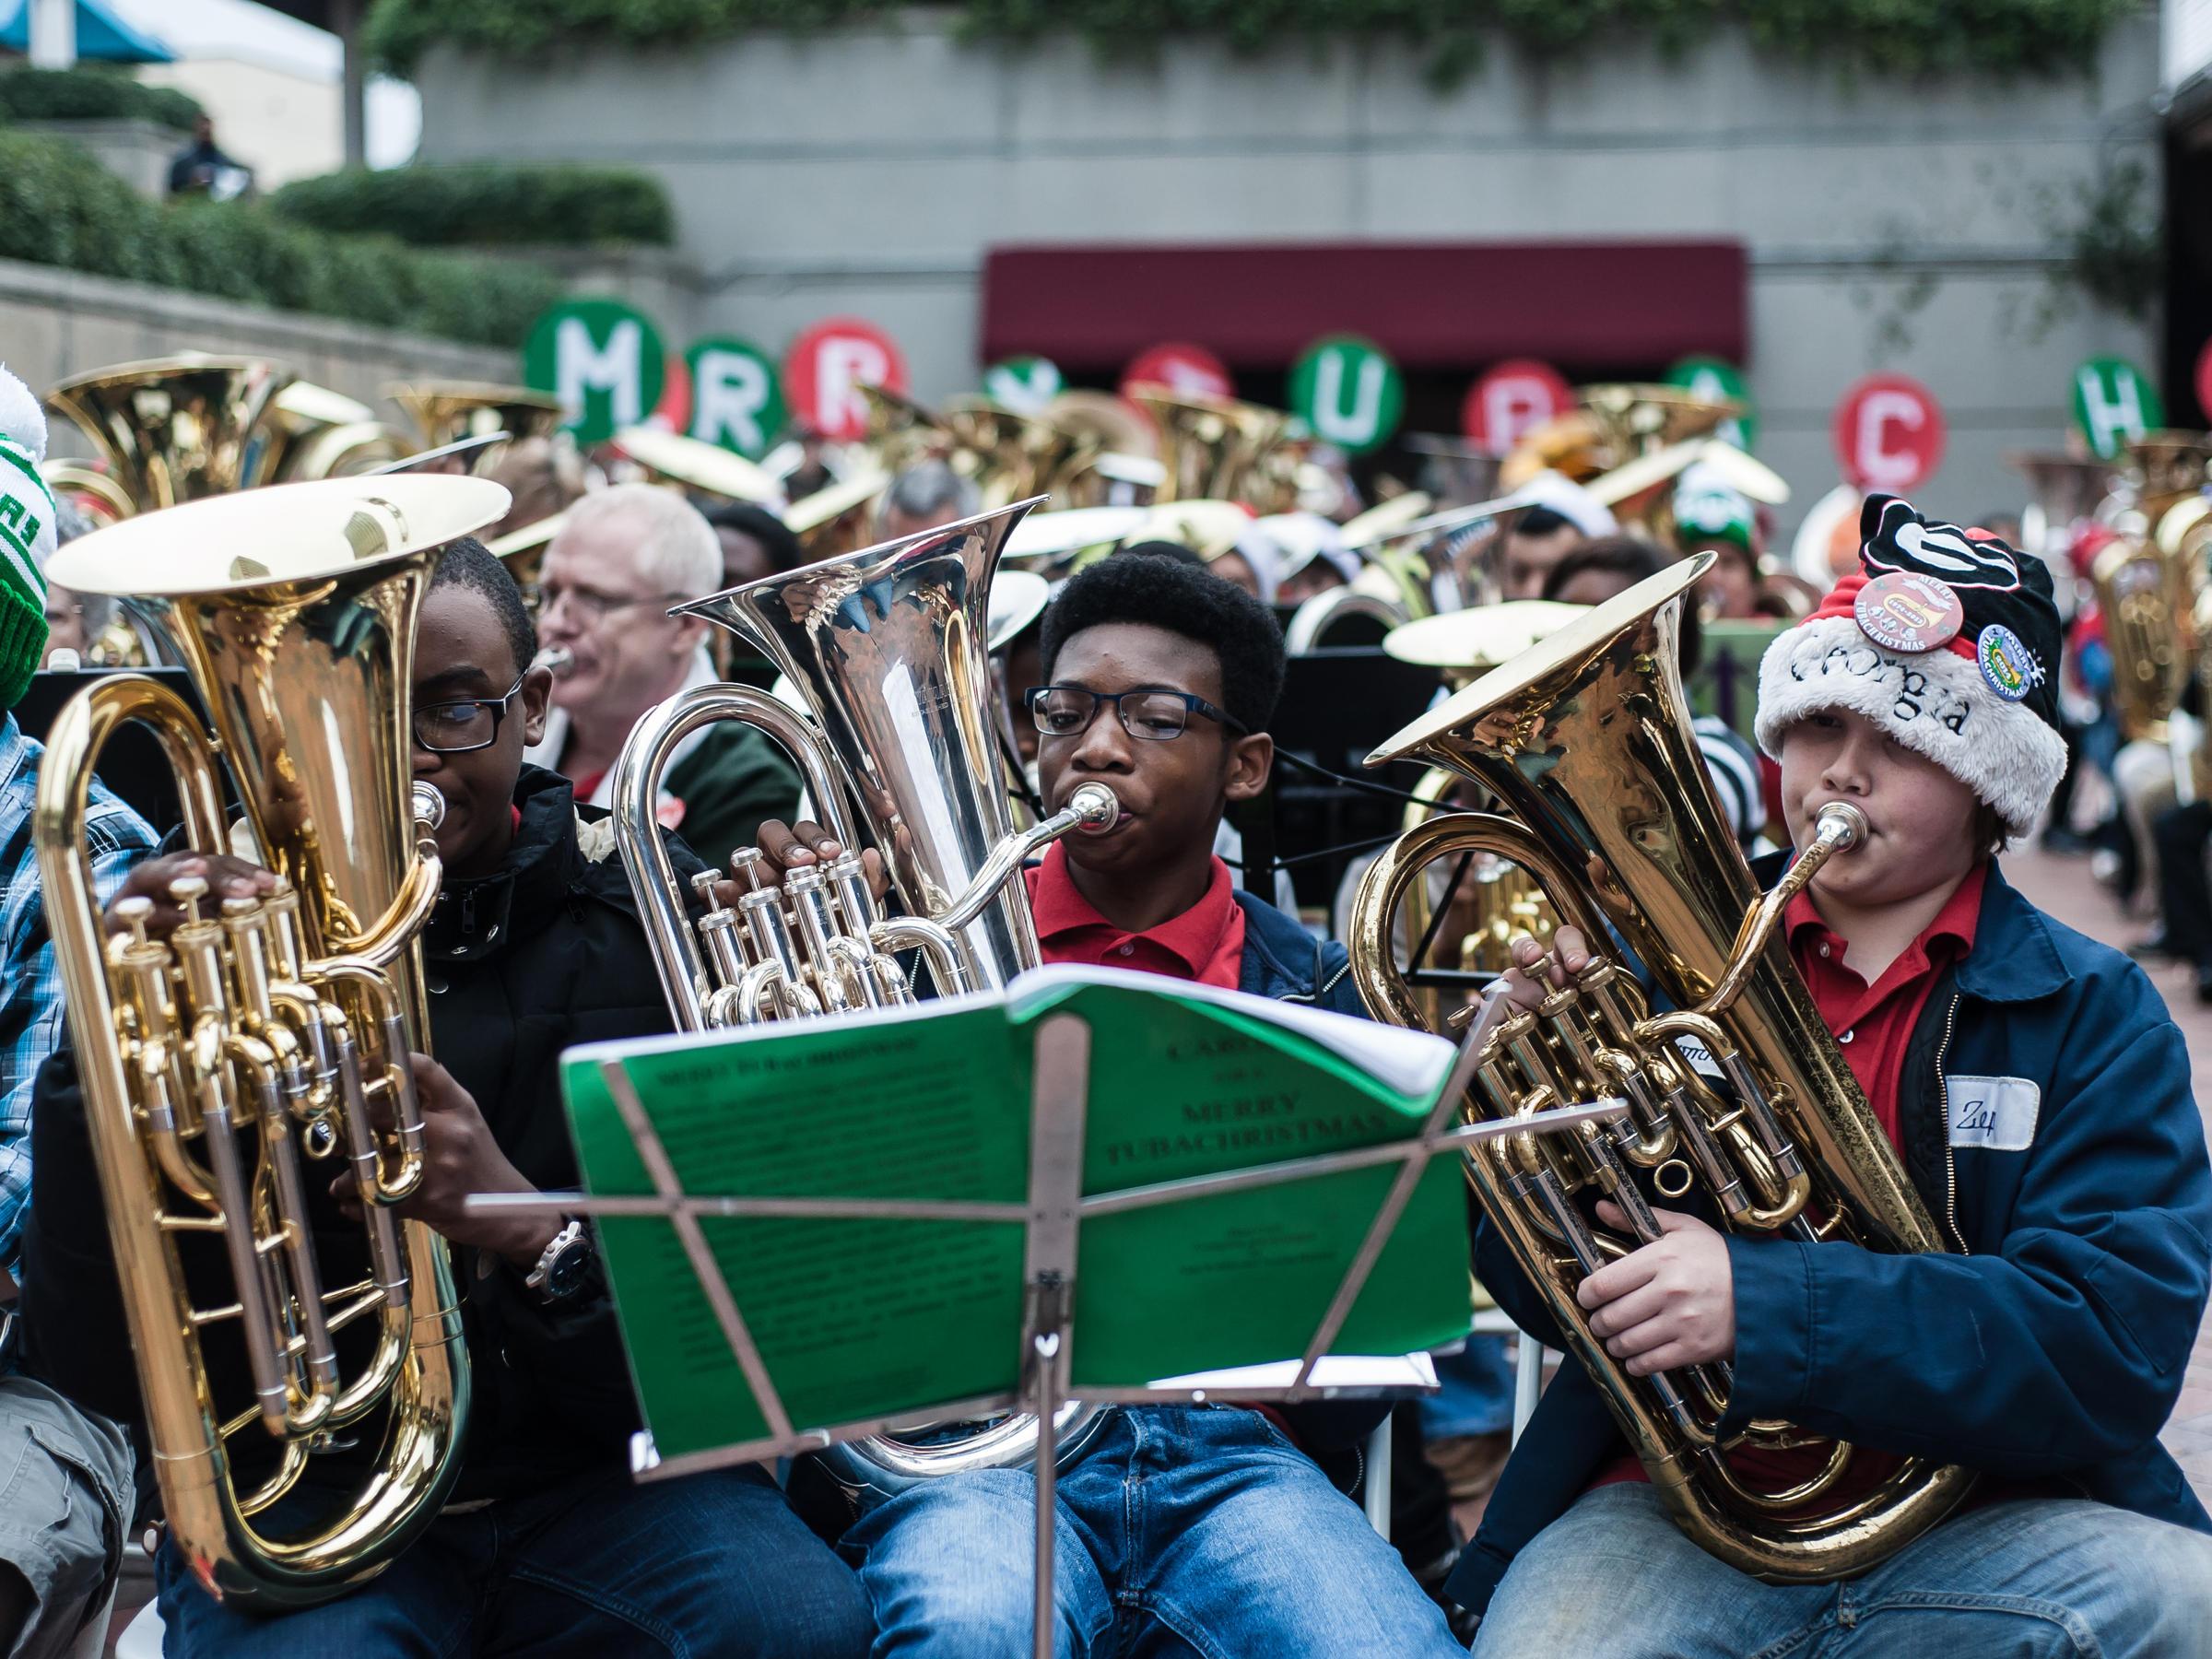 Tuba Christmas.At Tuba Christmas Low Brass Gets The Spotlight Wabe 90 1 Fm